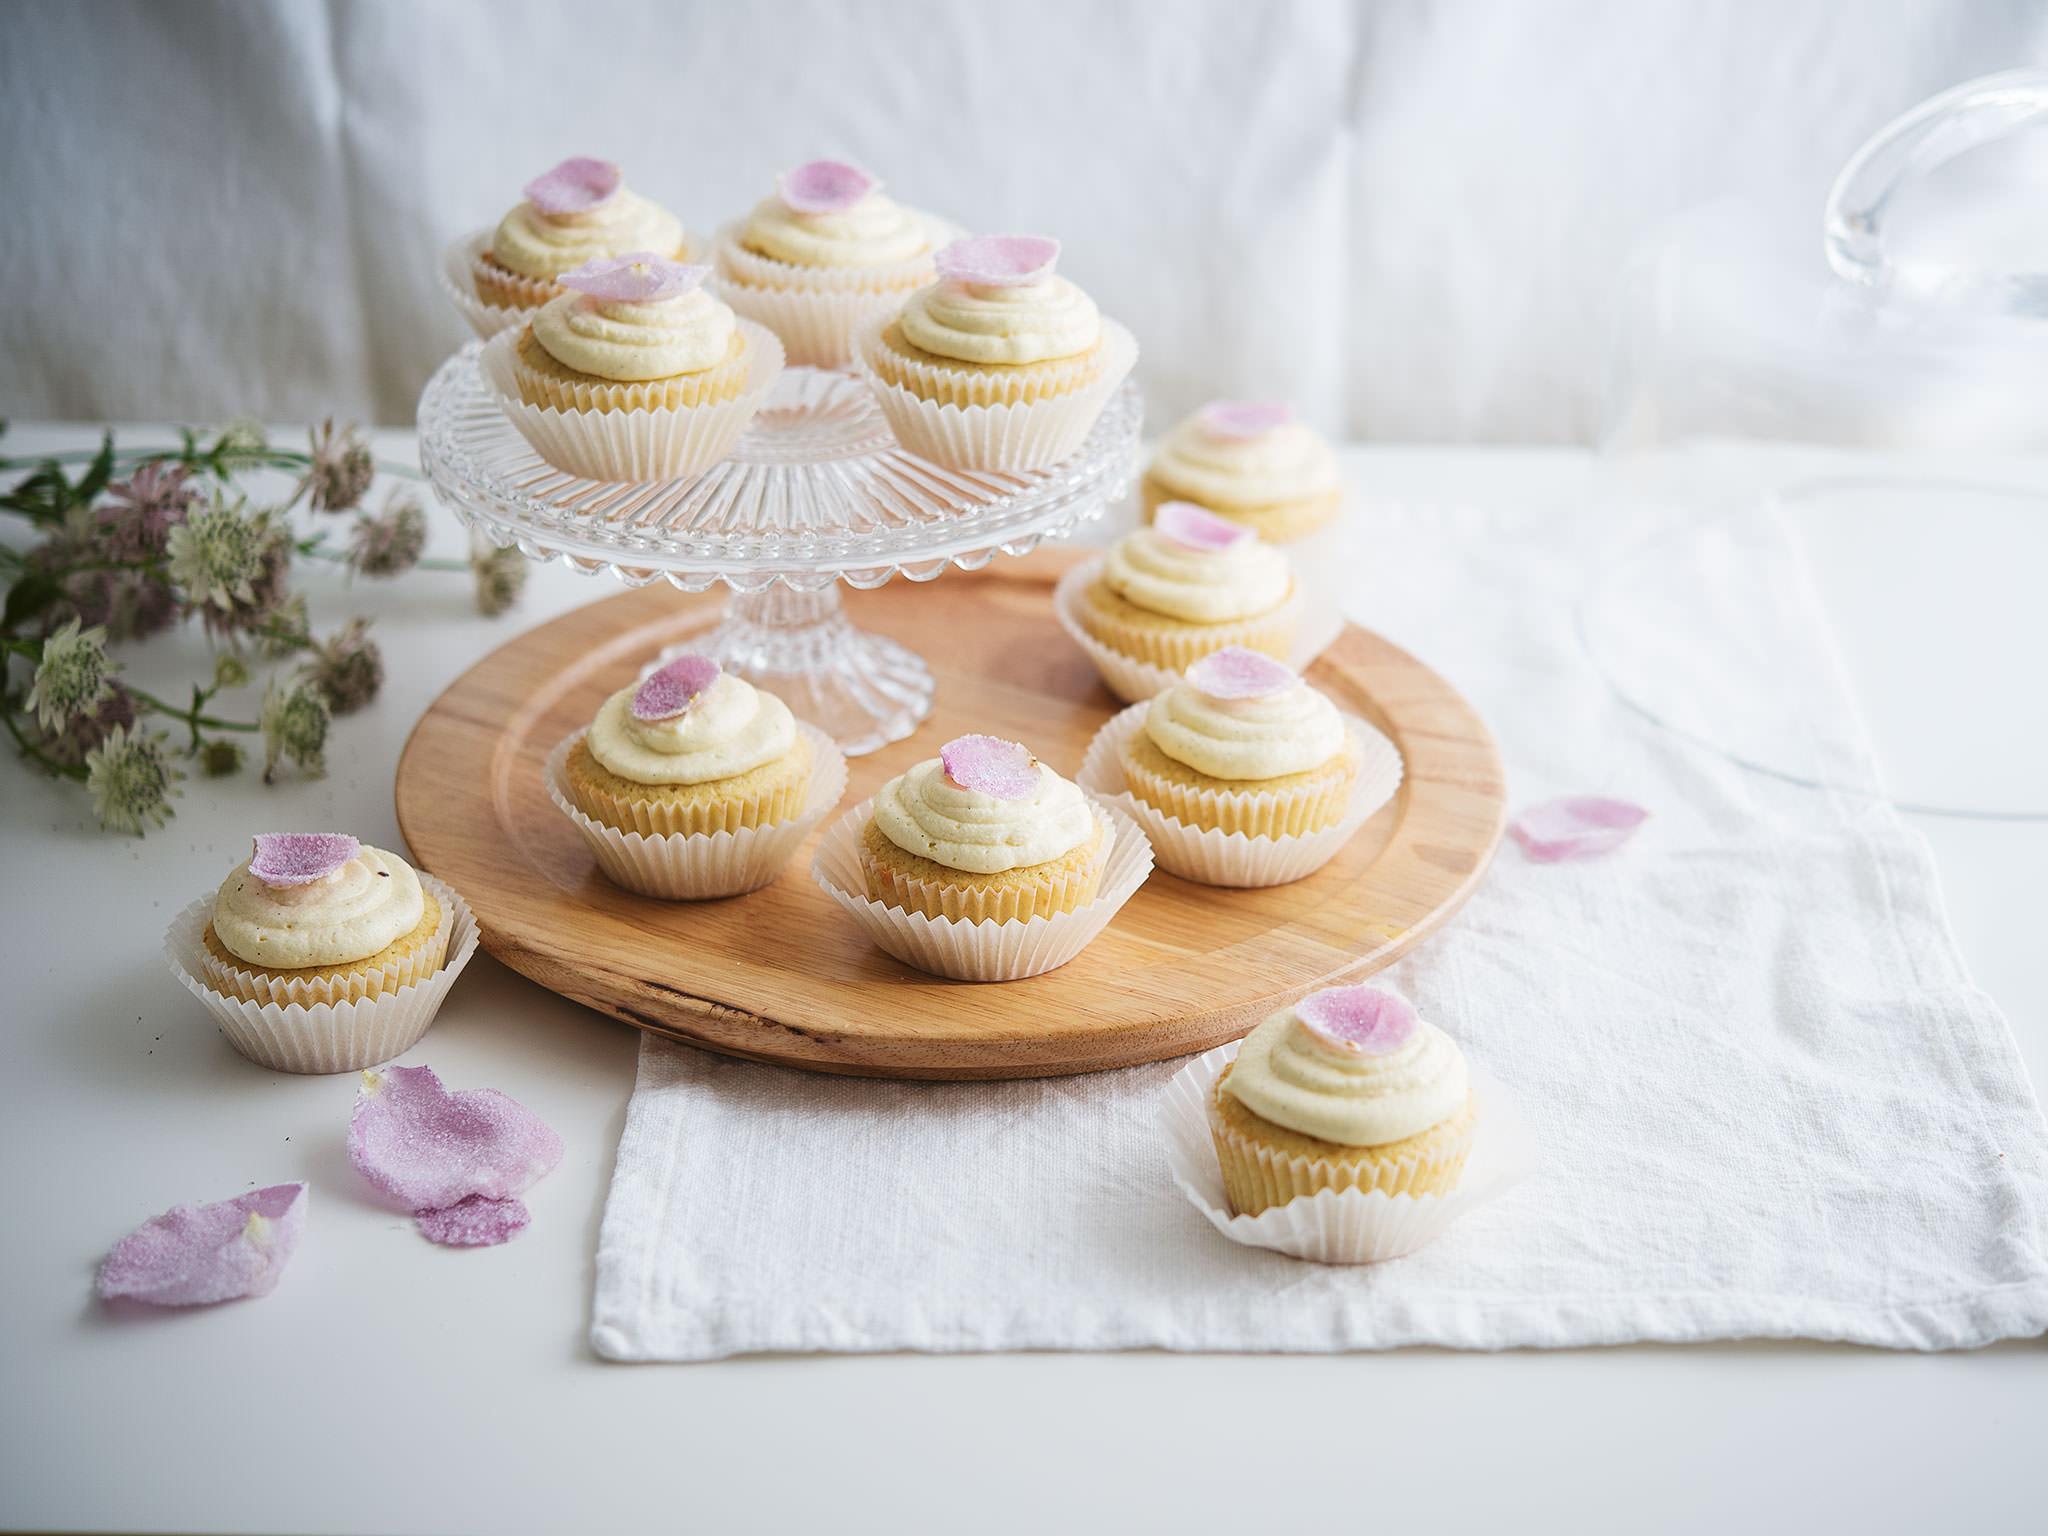 hochzeits cupcakes rezept mit video kitchen stories. Black Bedroom Furniture Sets. Home Design Ideas